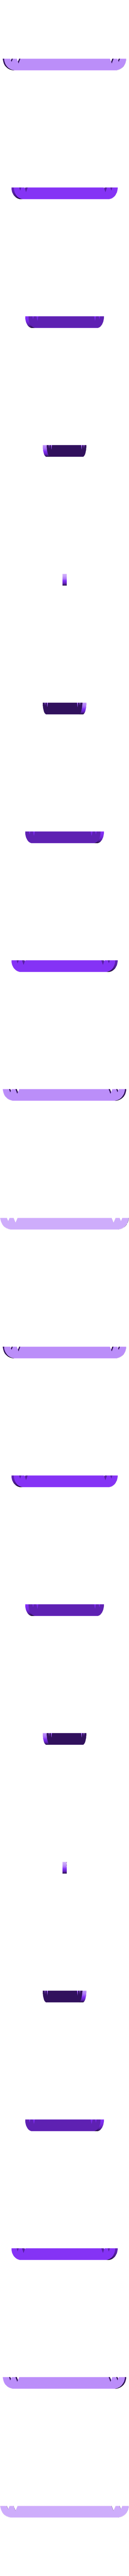 Color 3.2.stl Download free STL file Keychain Multicolor Hulk • 3D printer design, dukedoks